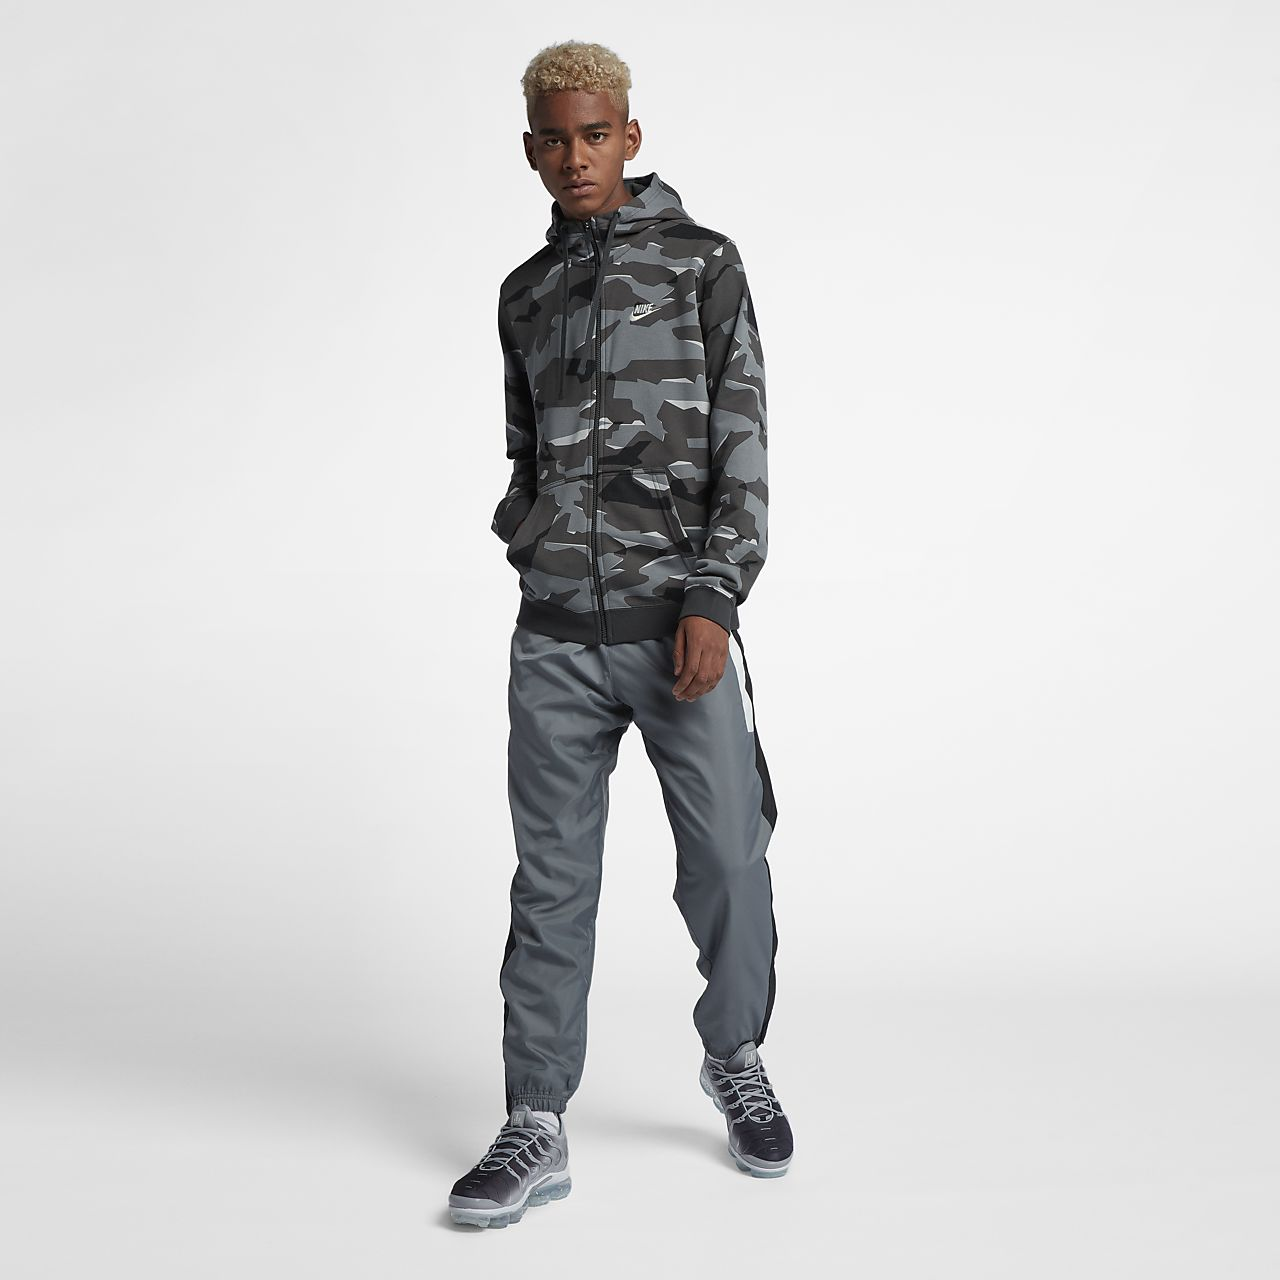 4c4897a1c791 Nike Sportswear Club Fleece Men s Full-Zip Camo Hoodie. Nike.com CA